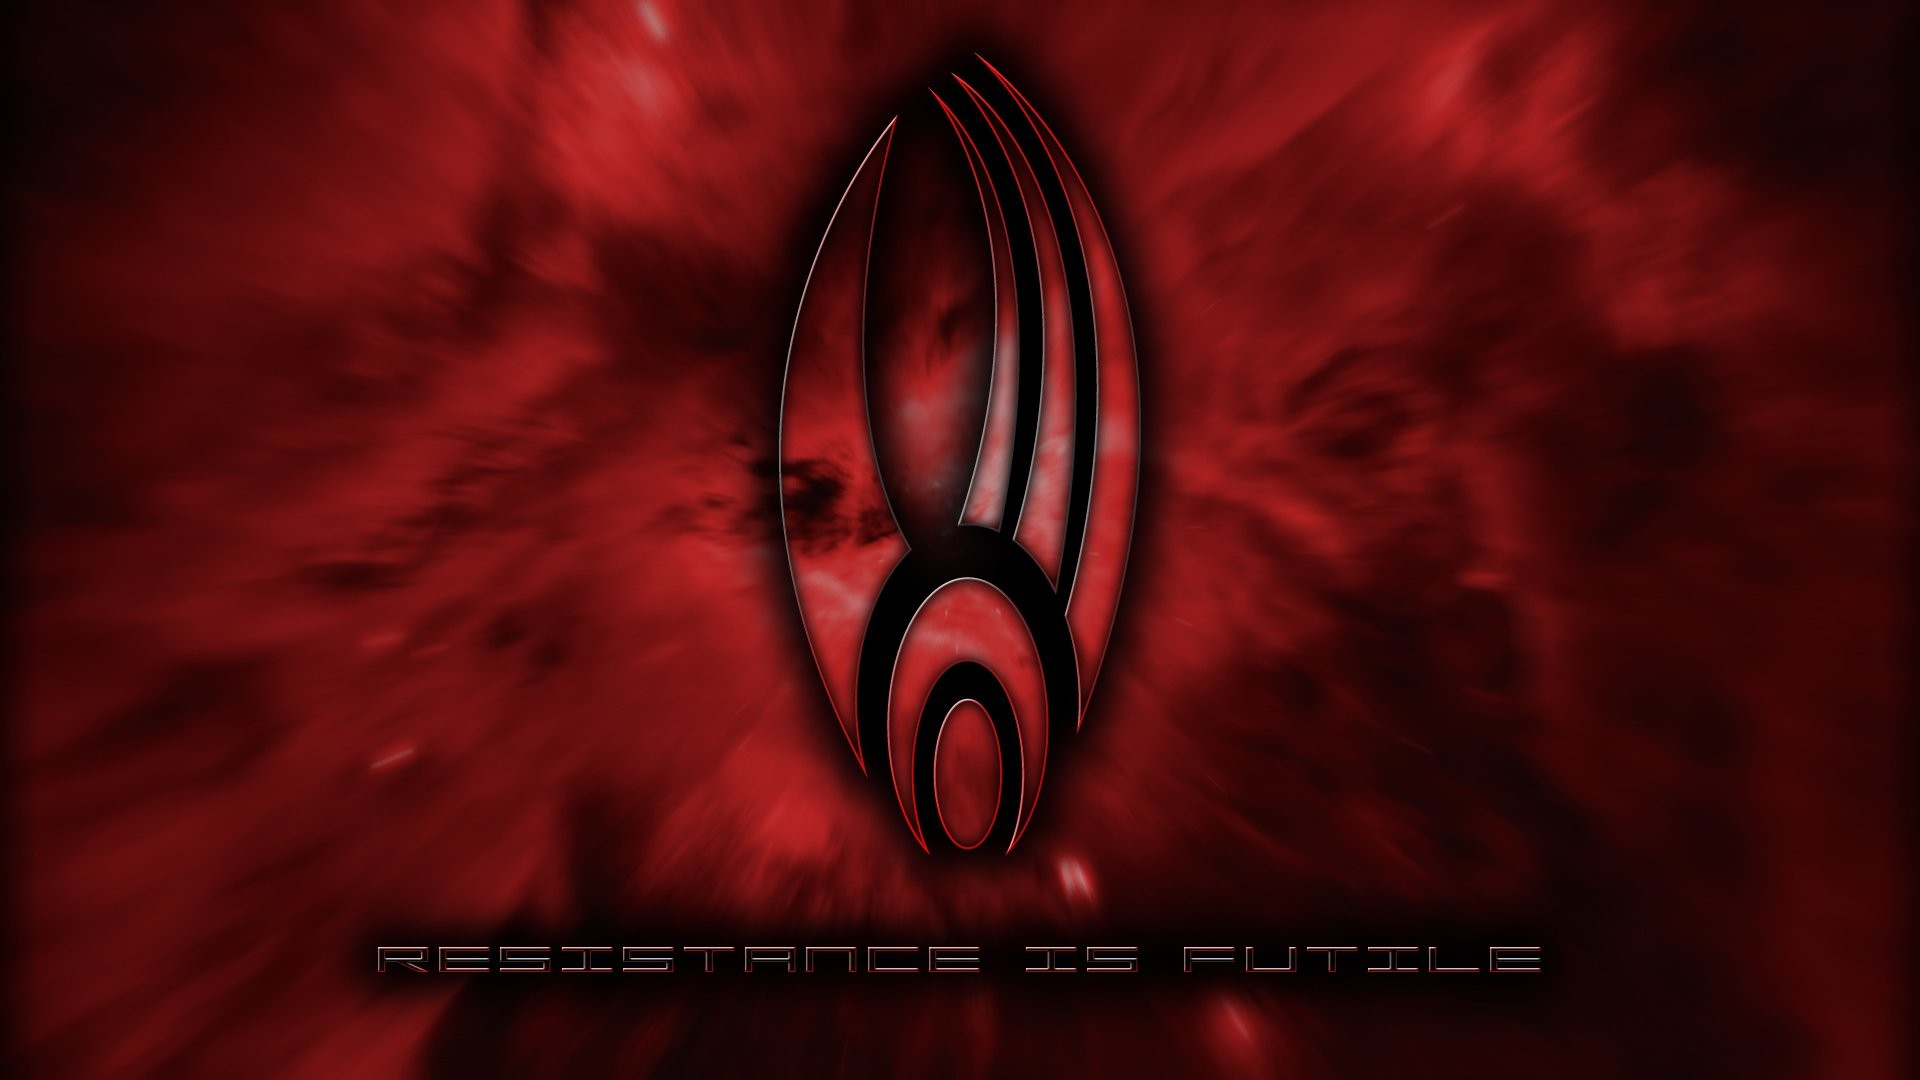 Res: 1920x1080, Sci Fi - Star Trek Wallpaper